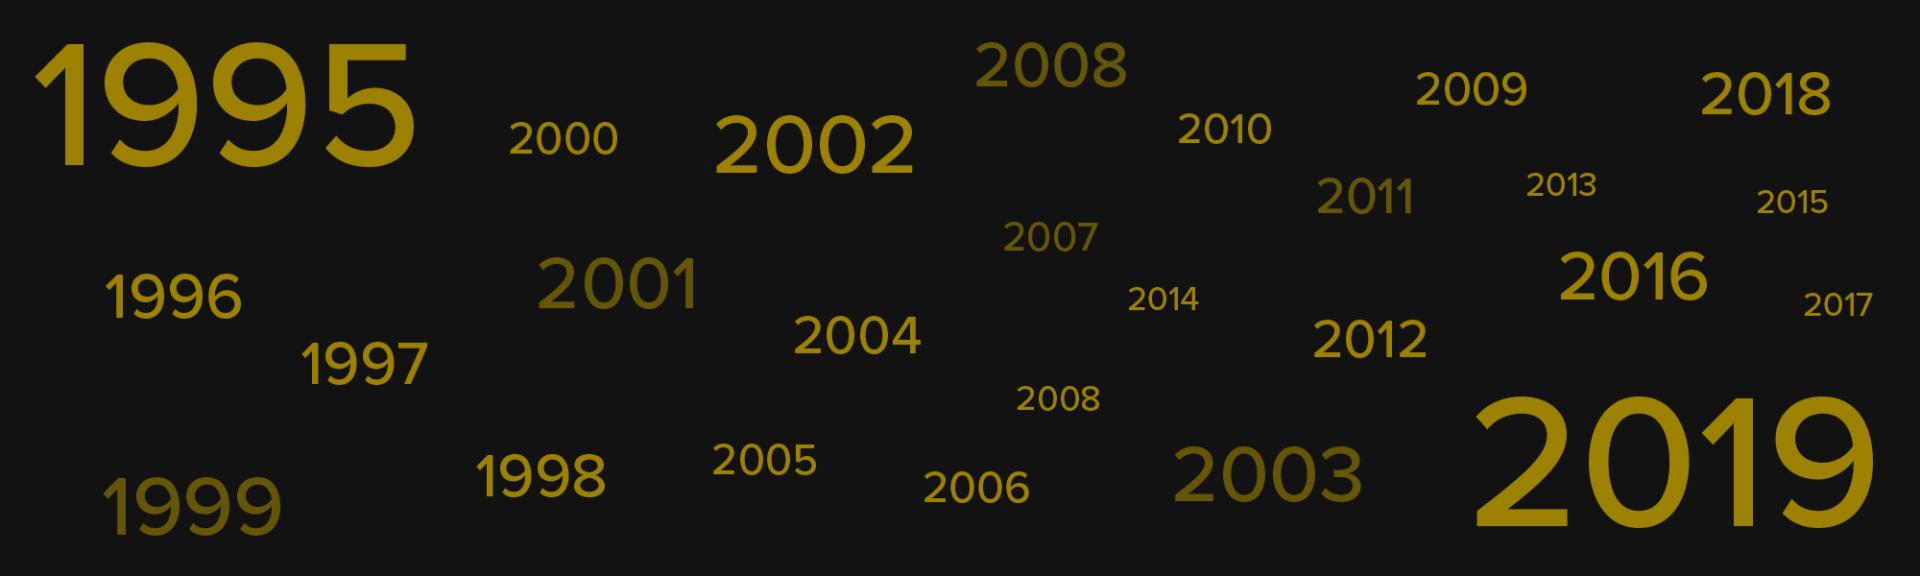 Distinctive Awards